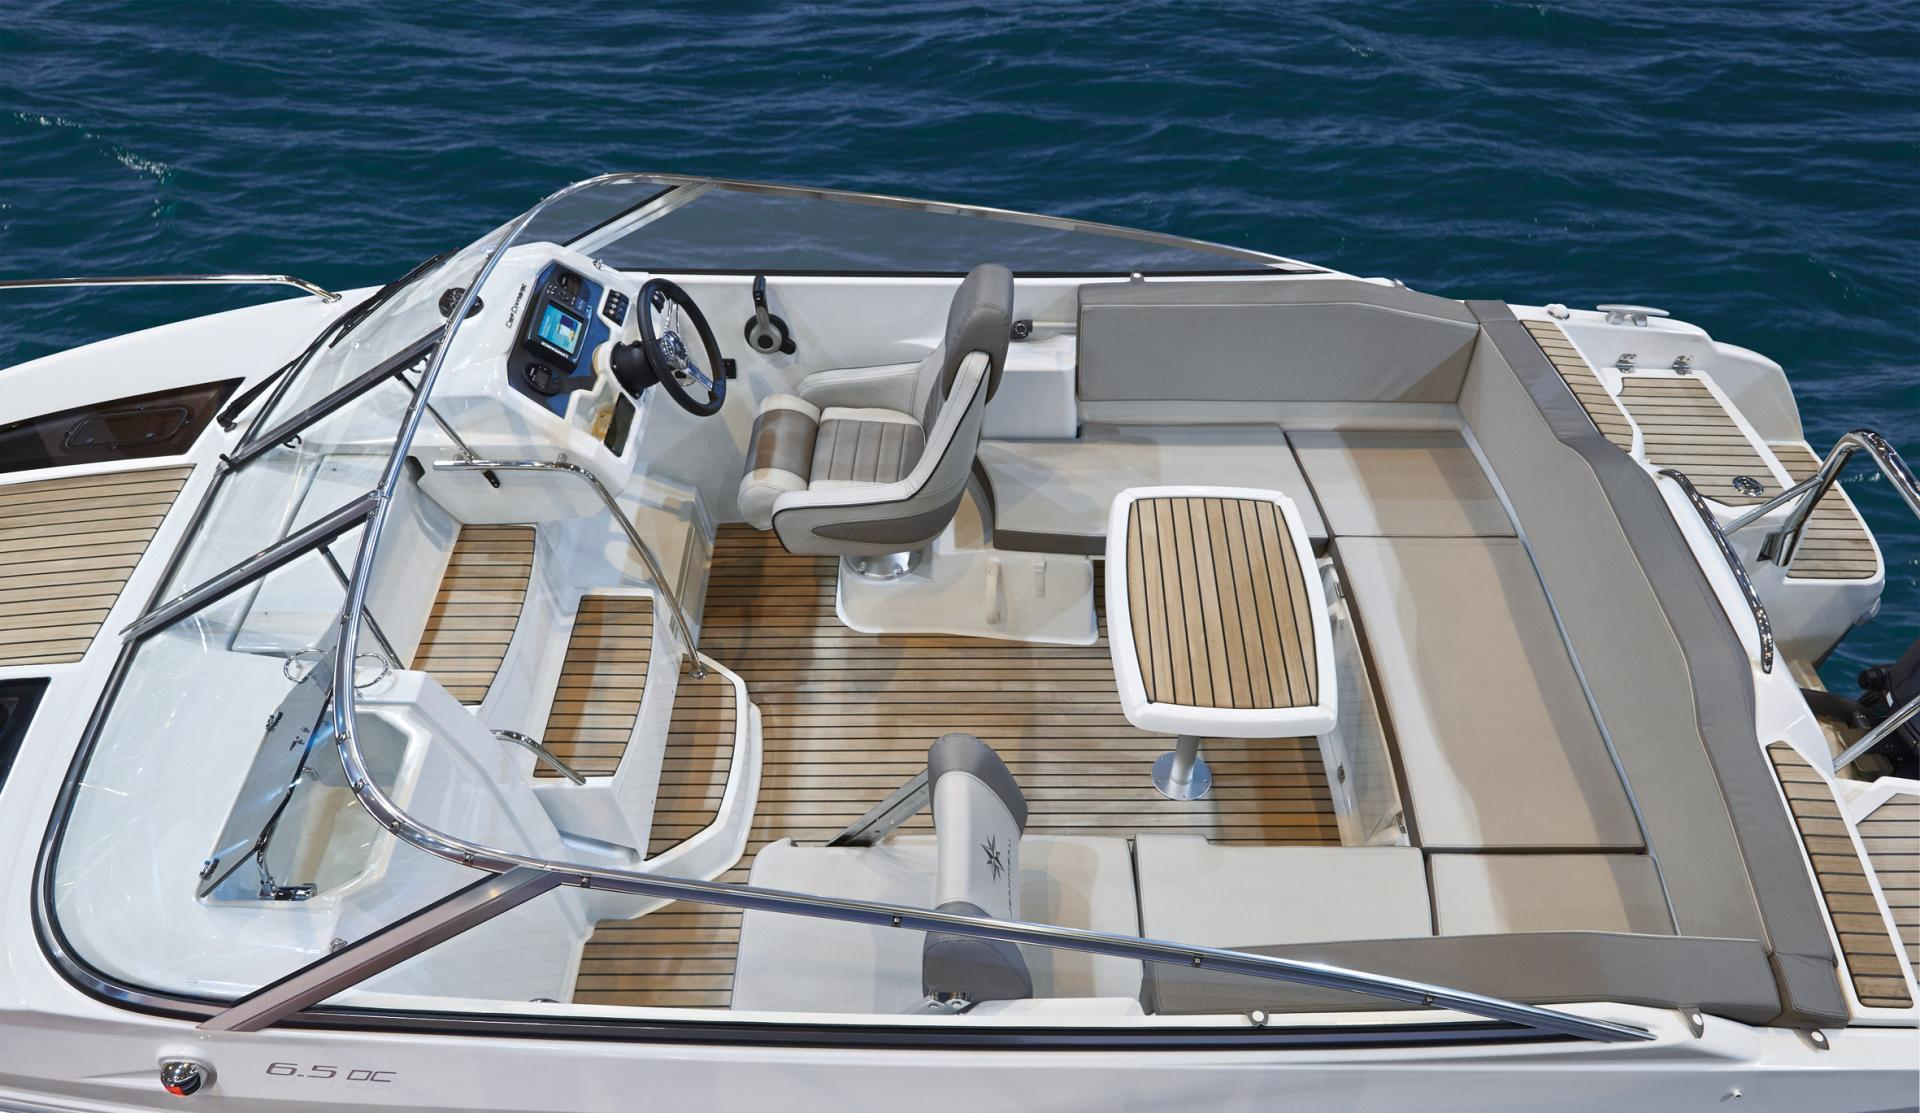 Sailing in Halong Bay with Cap Camarat 6.5 WA